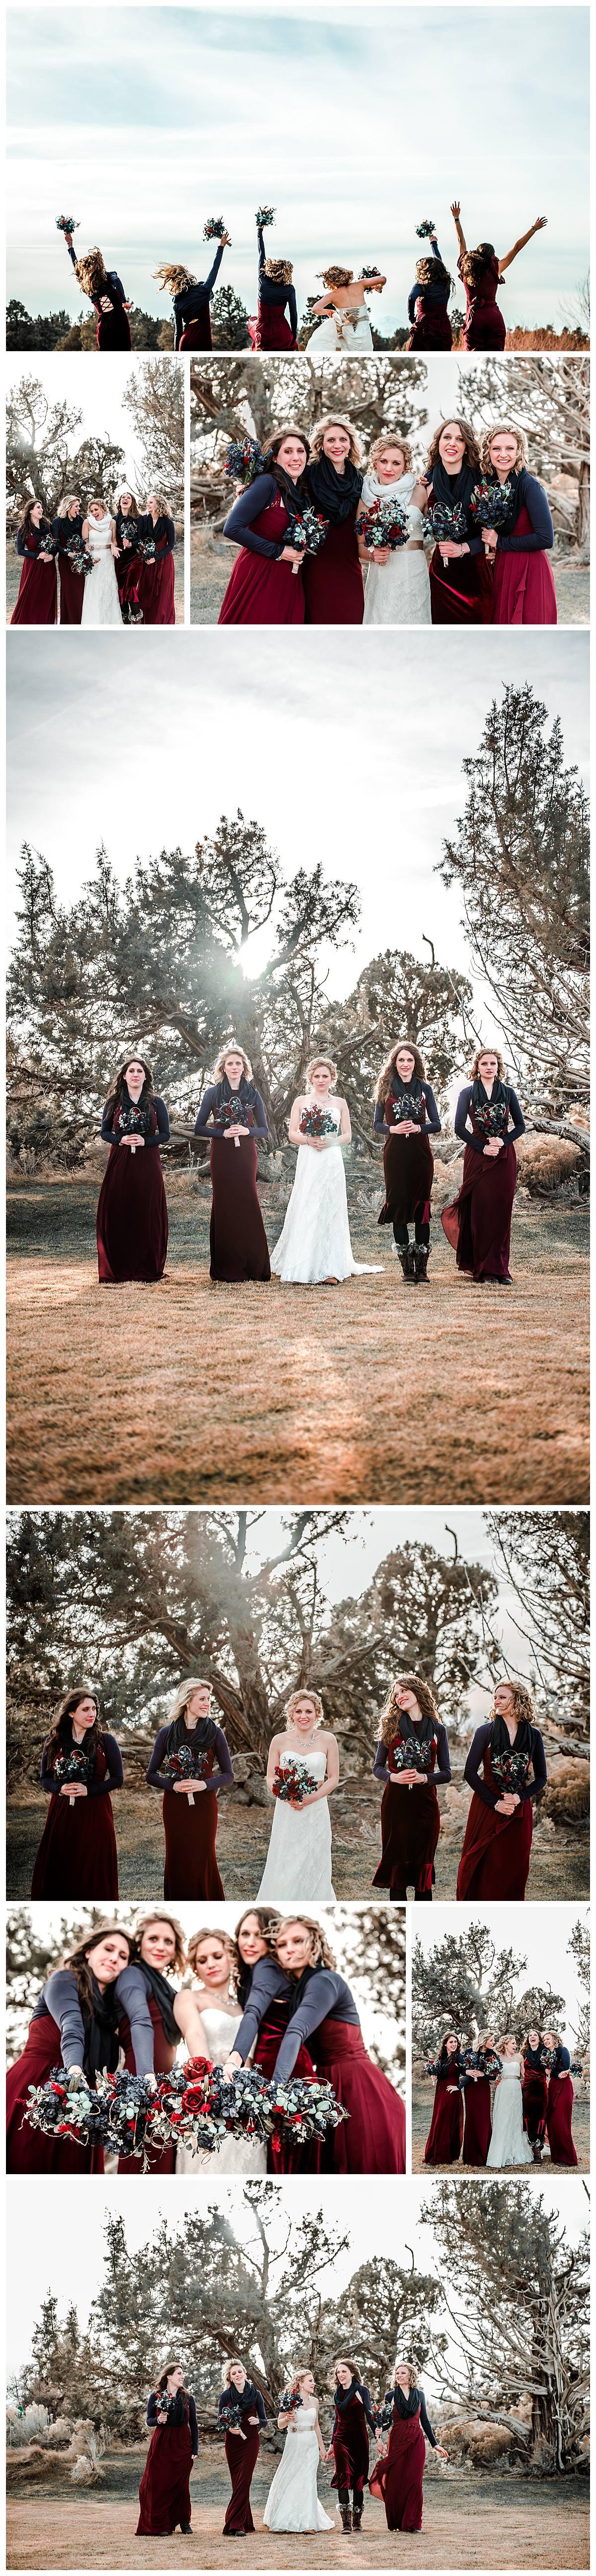 Bend Portland Oregon wedding photographer